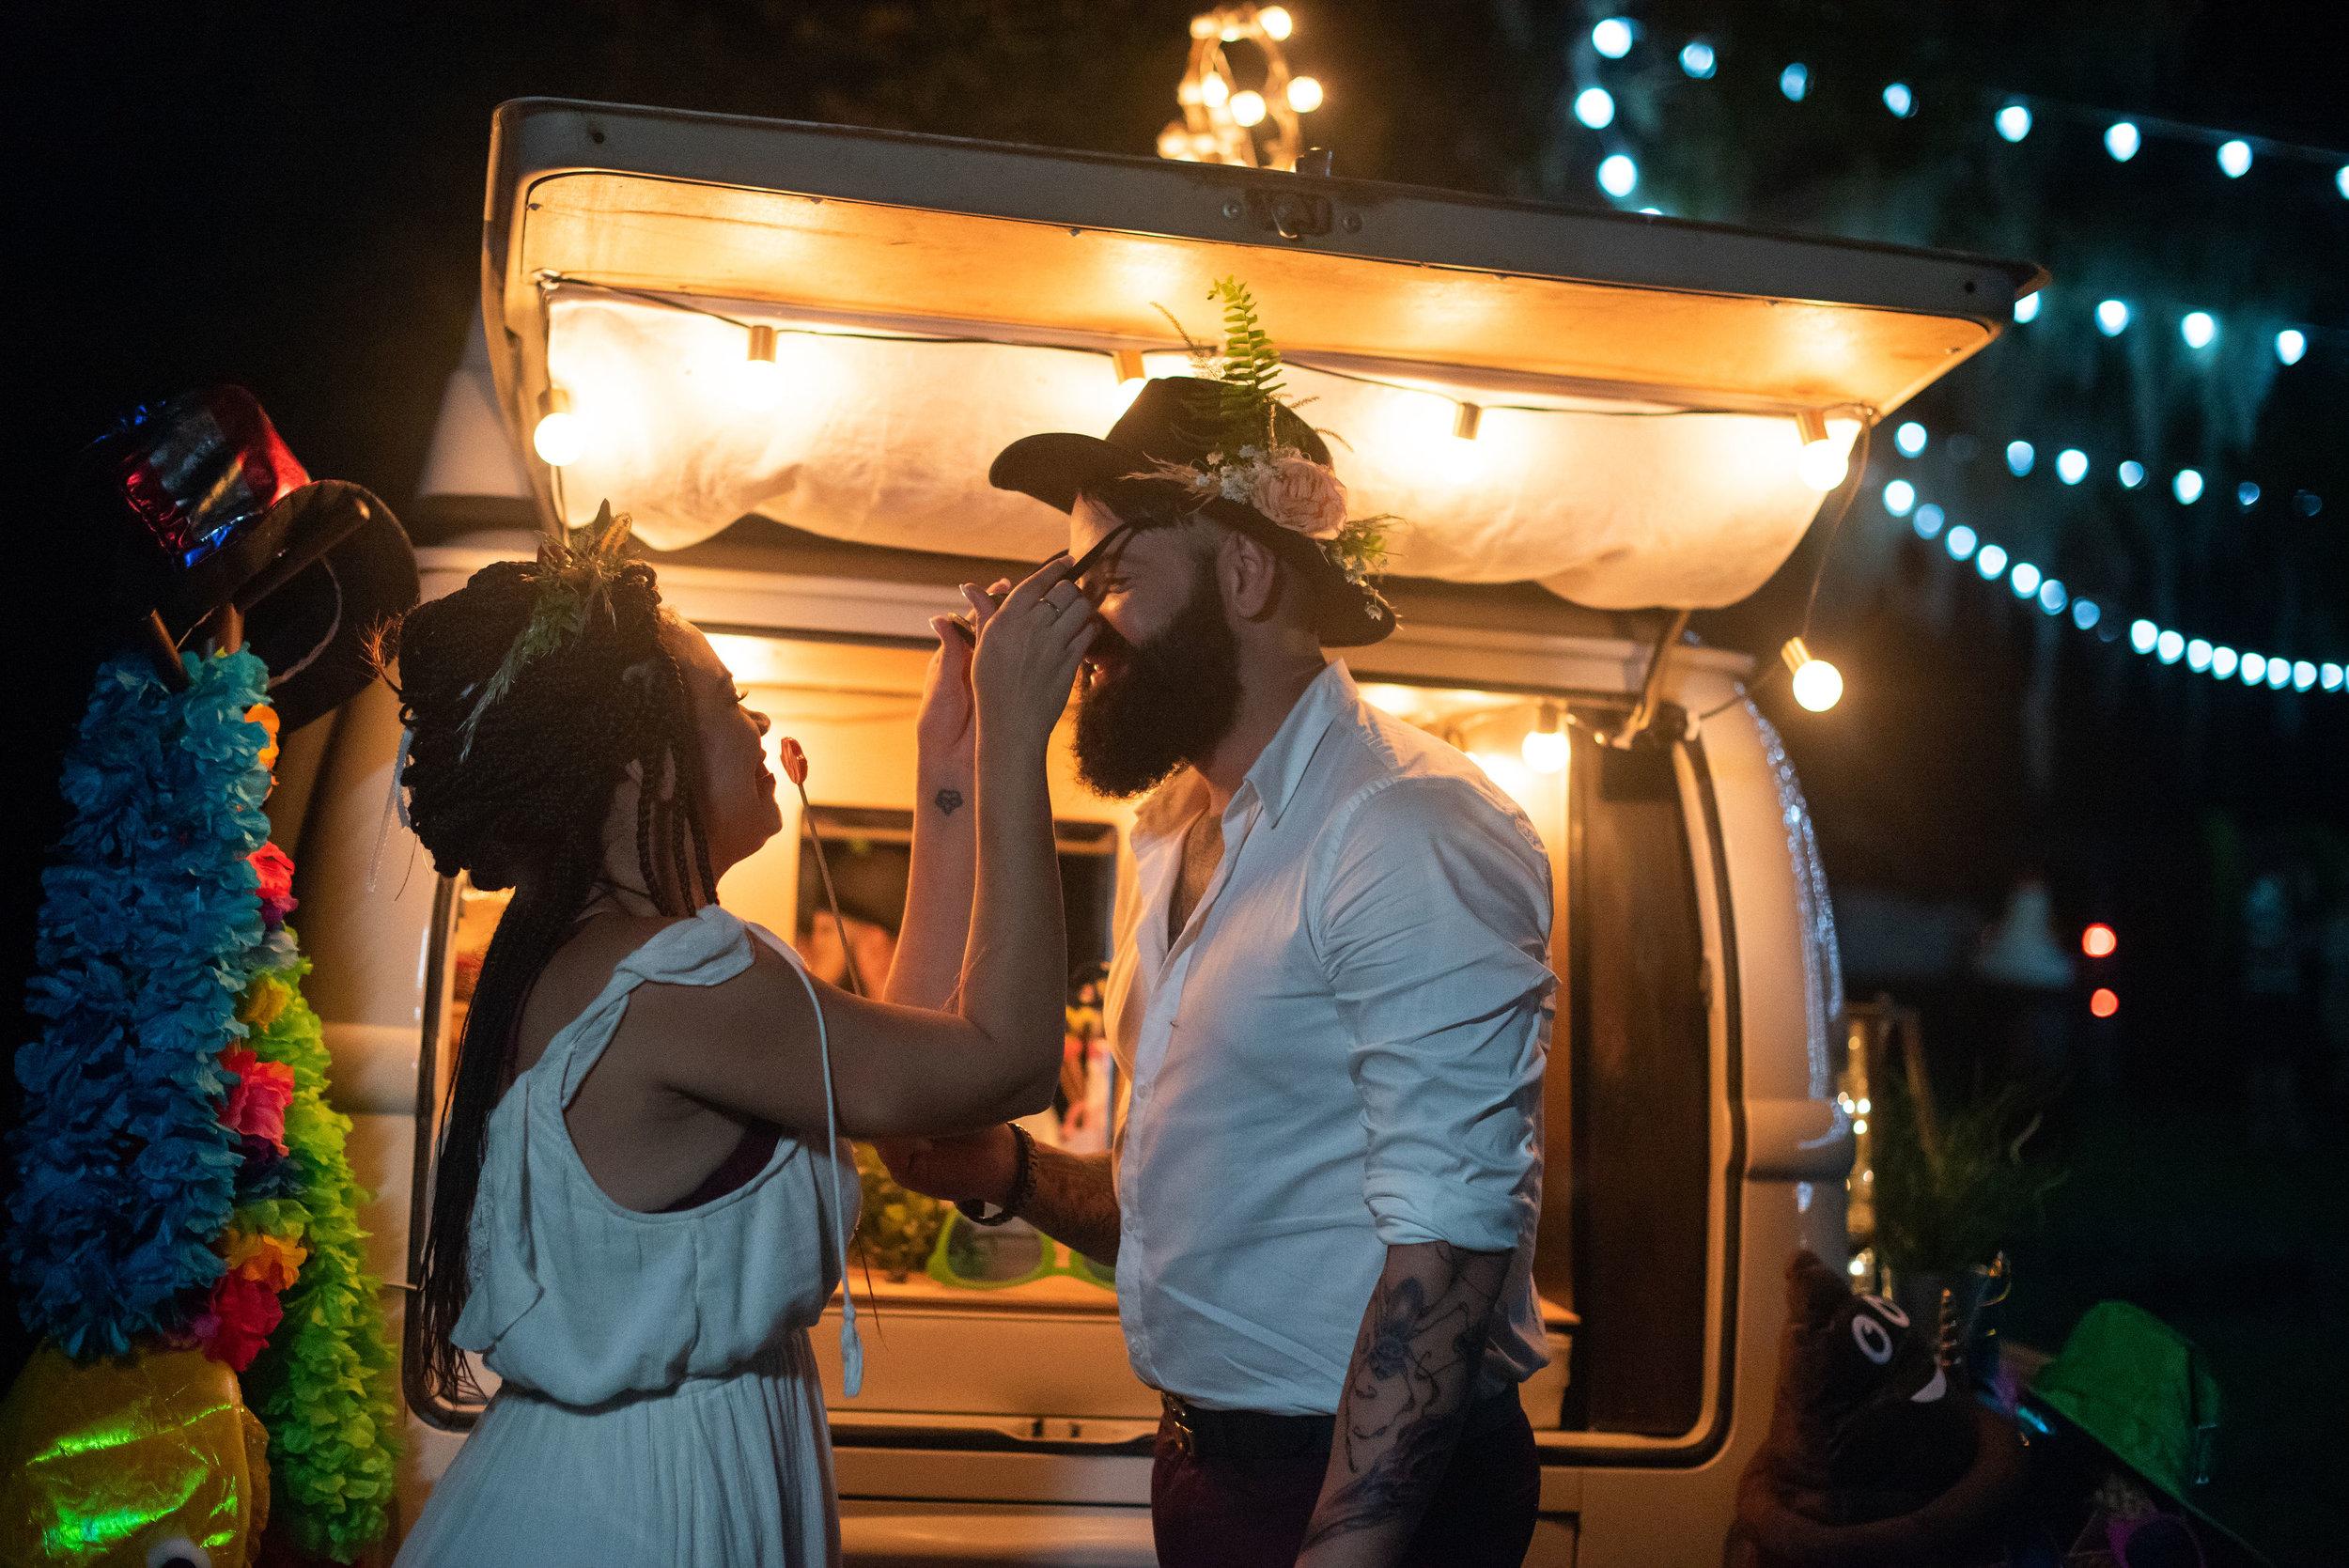 st-augustine-photographer-sarah-annay-wedfest2018-319.jpg